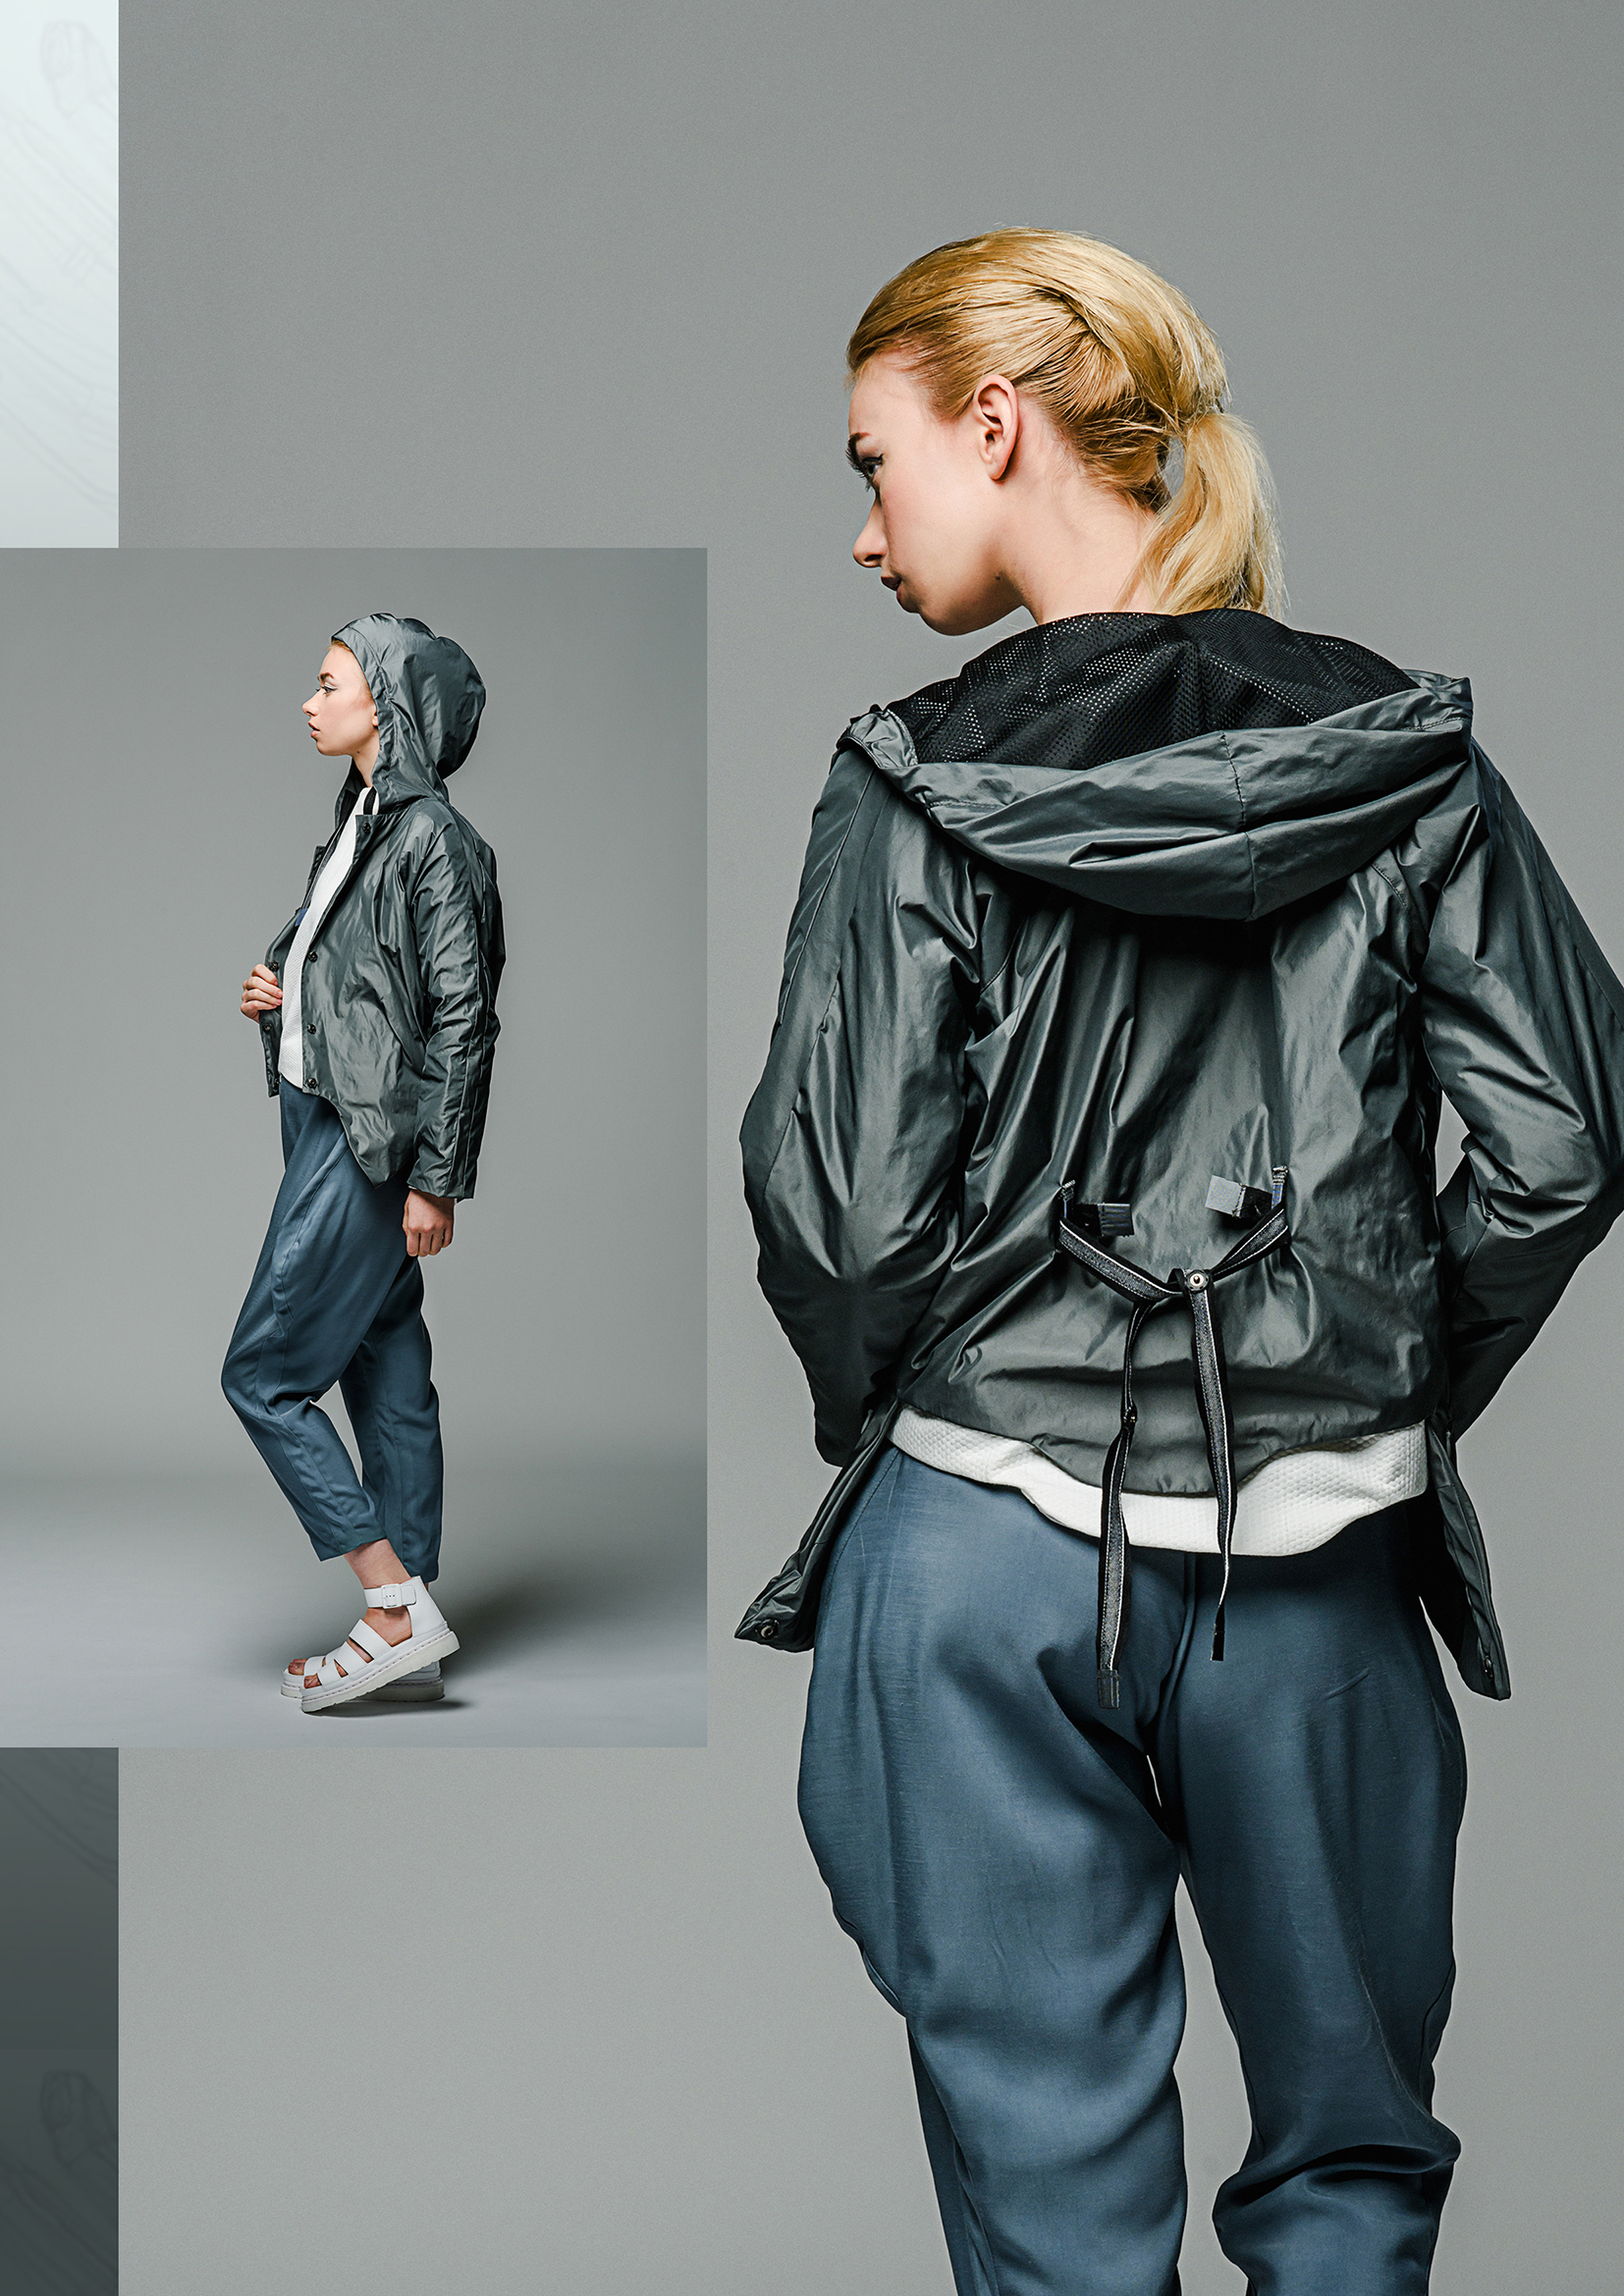 o_rainjacketbackwebsite.jpg